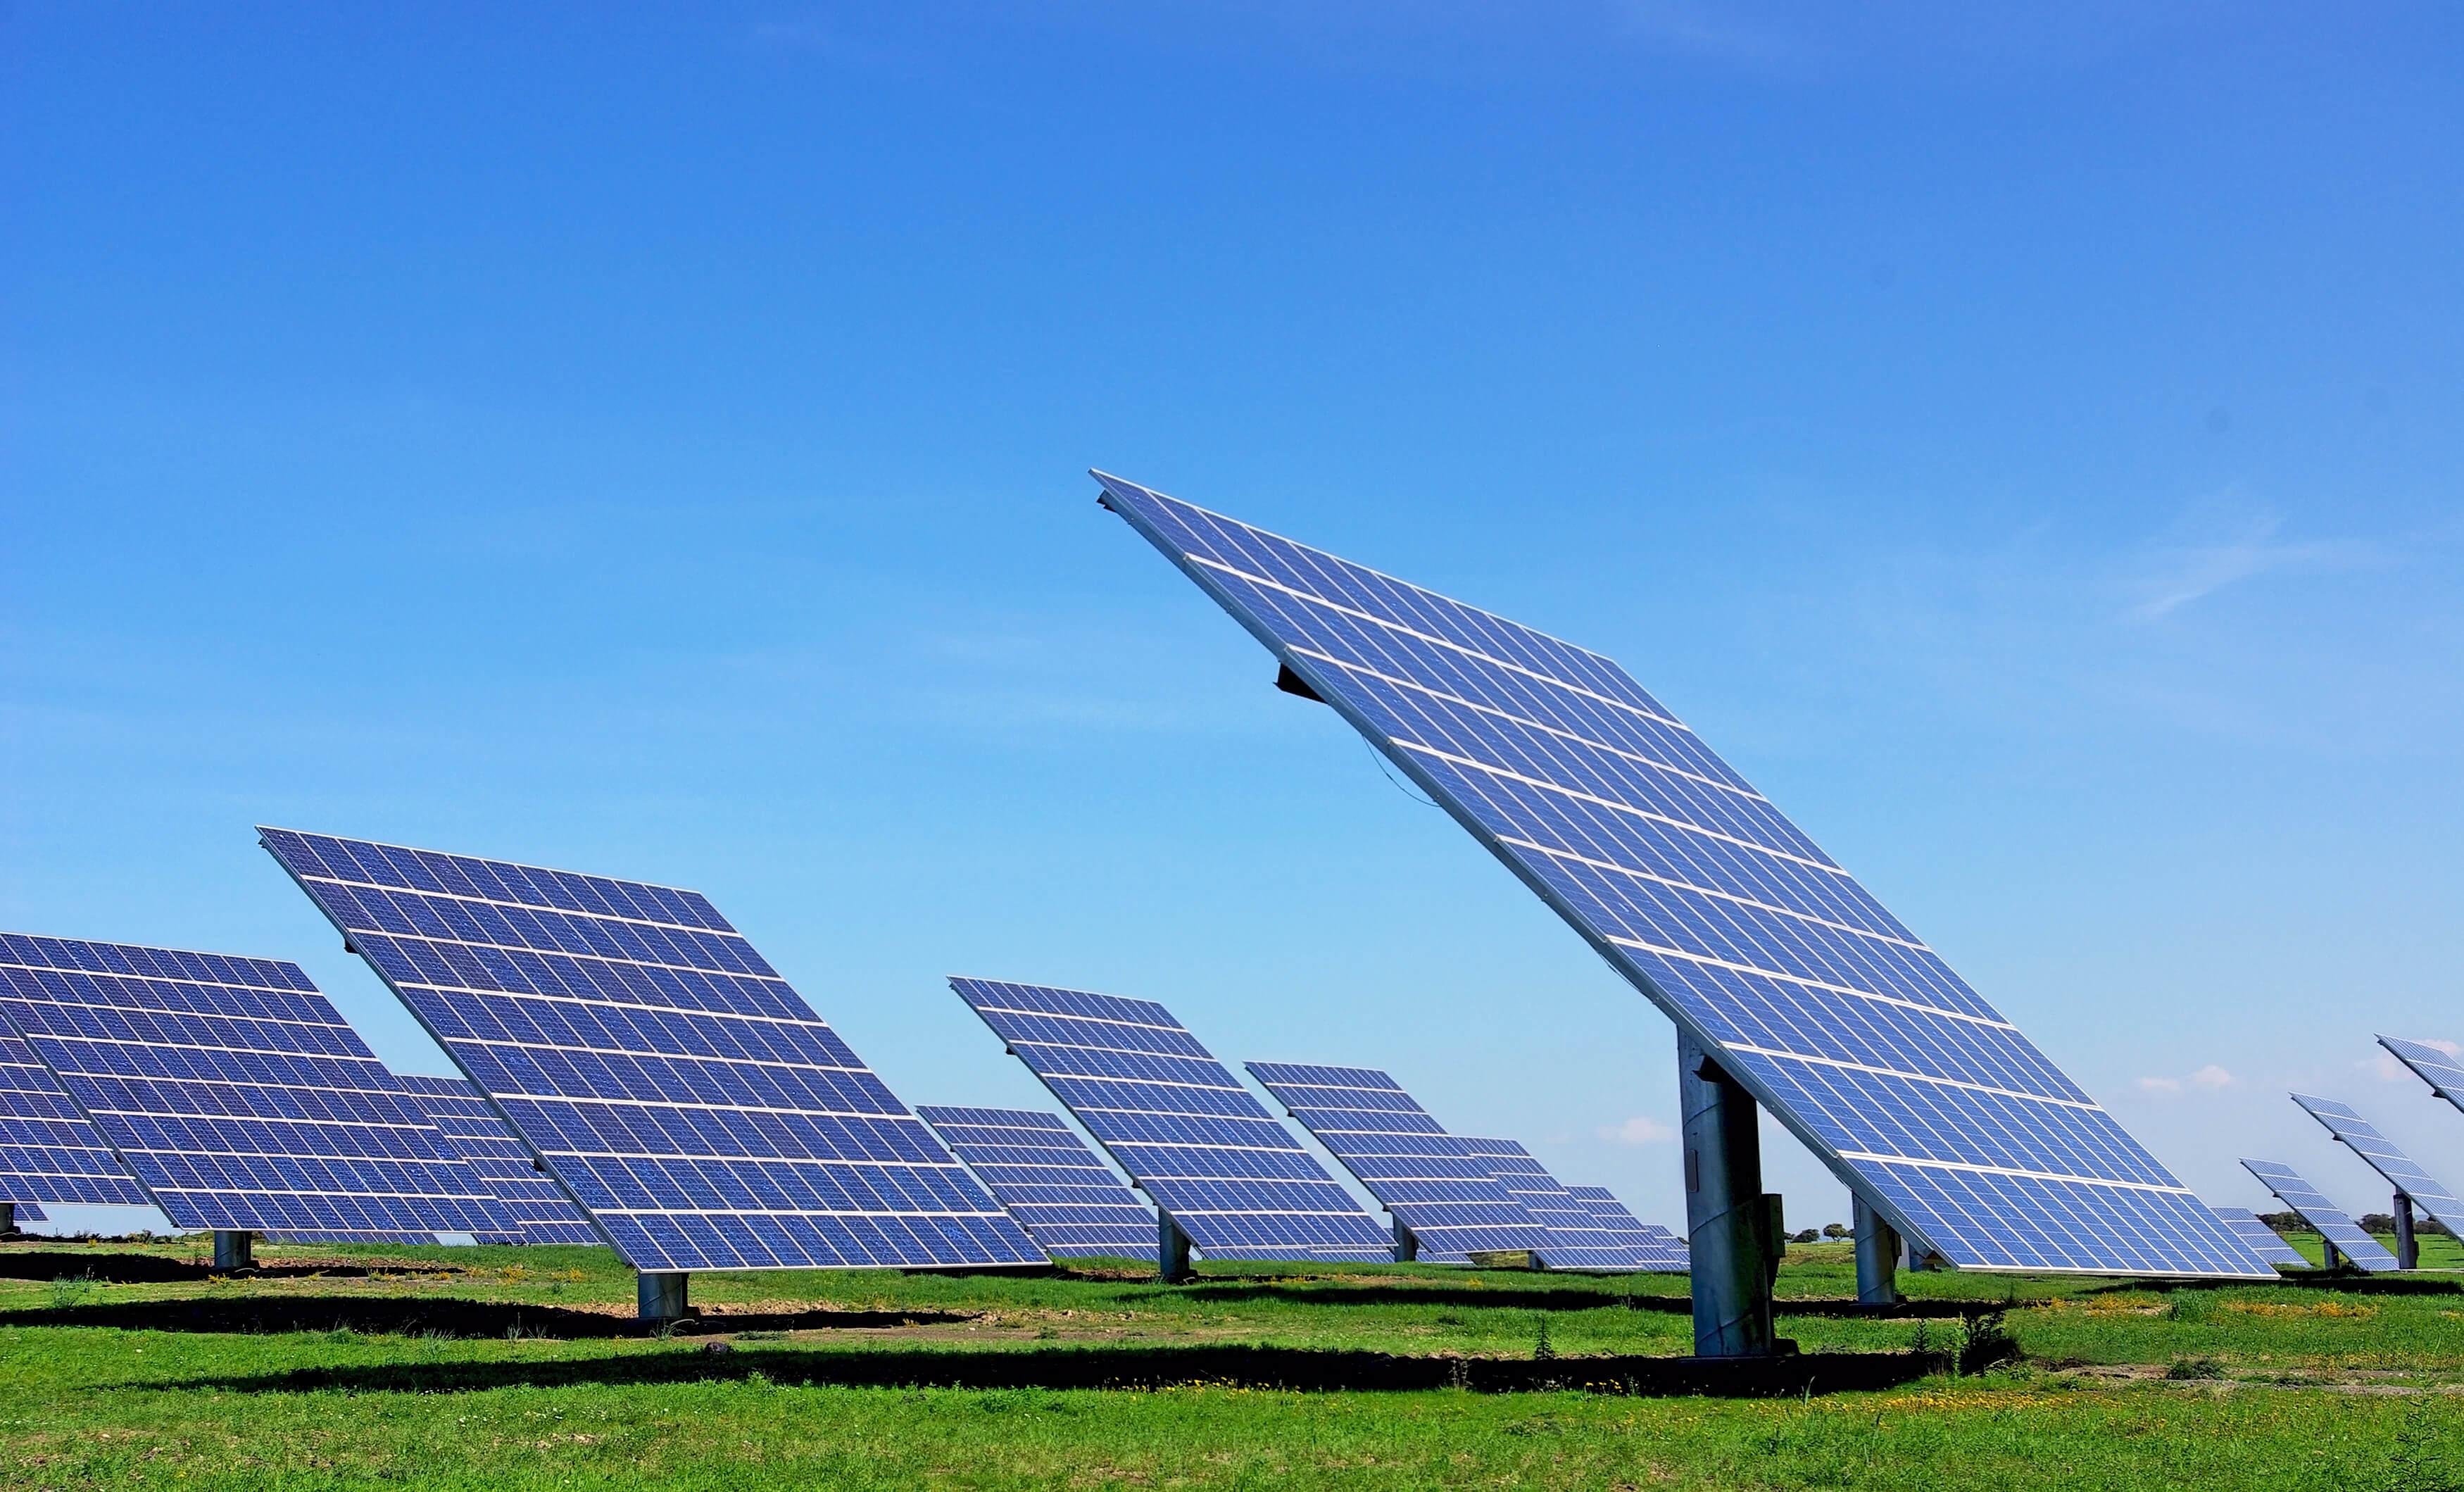 Orientation, Tilt and Shading Affect Solar Power Output